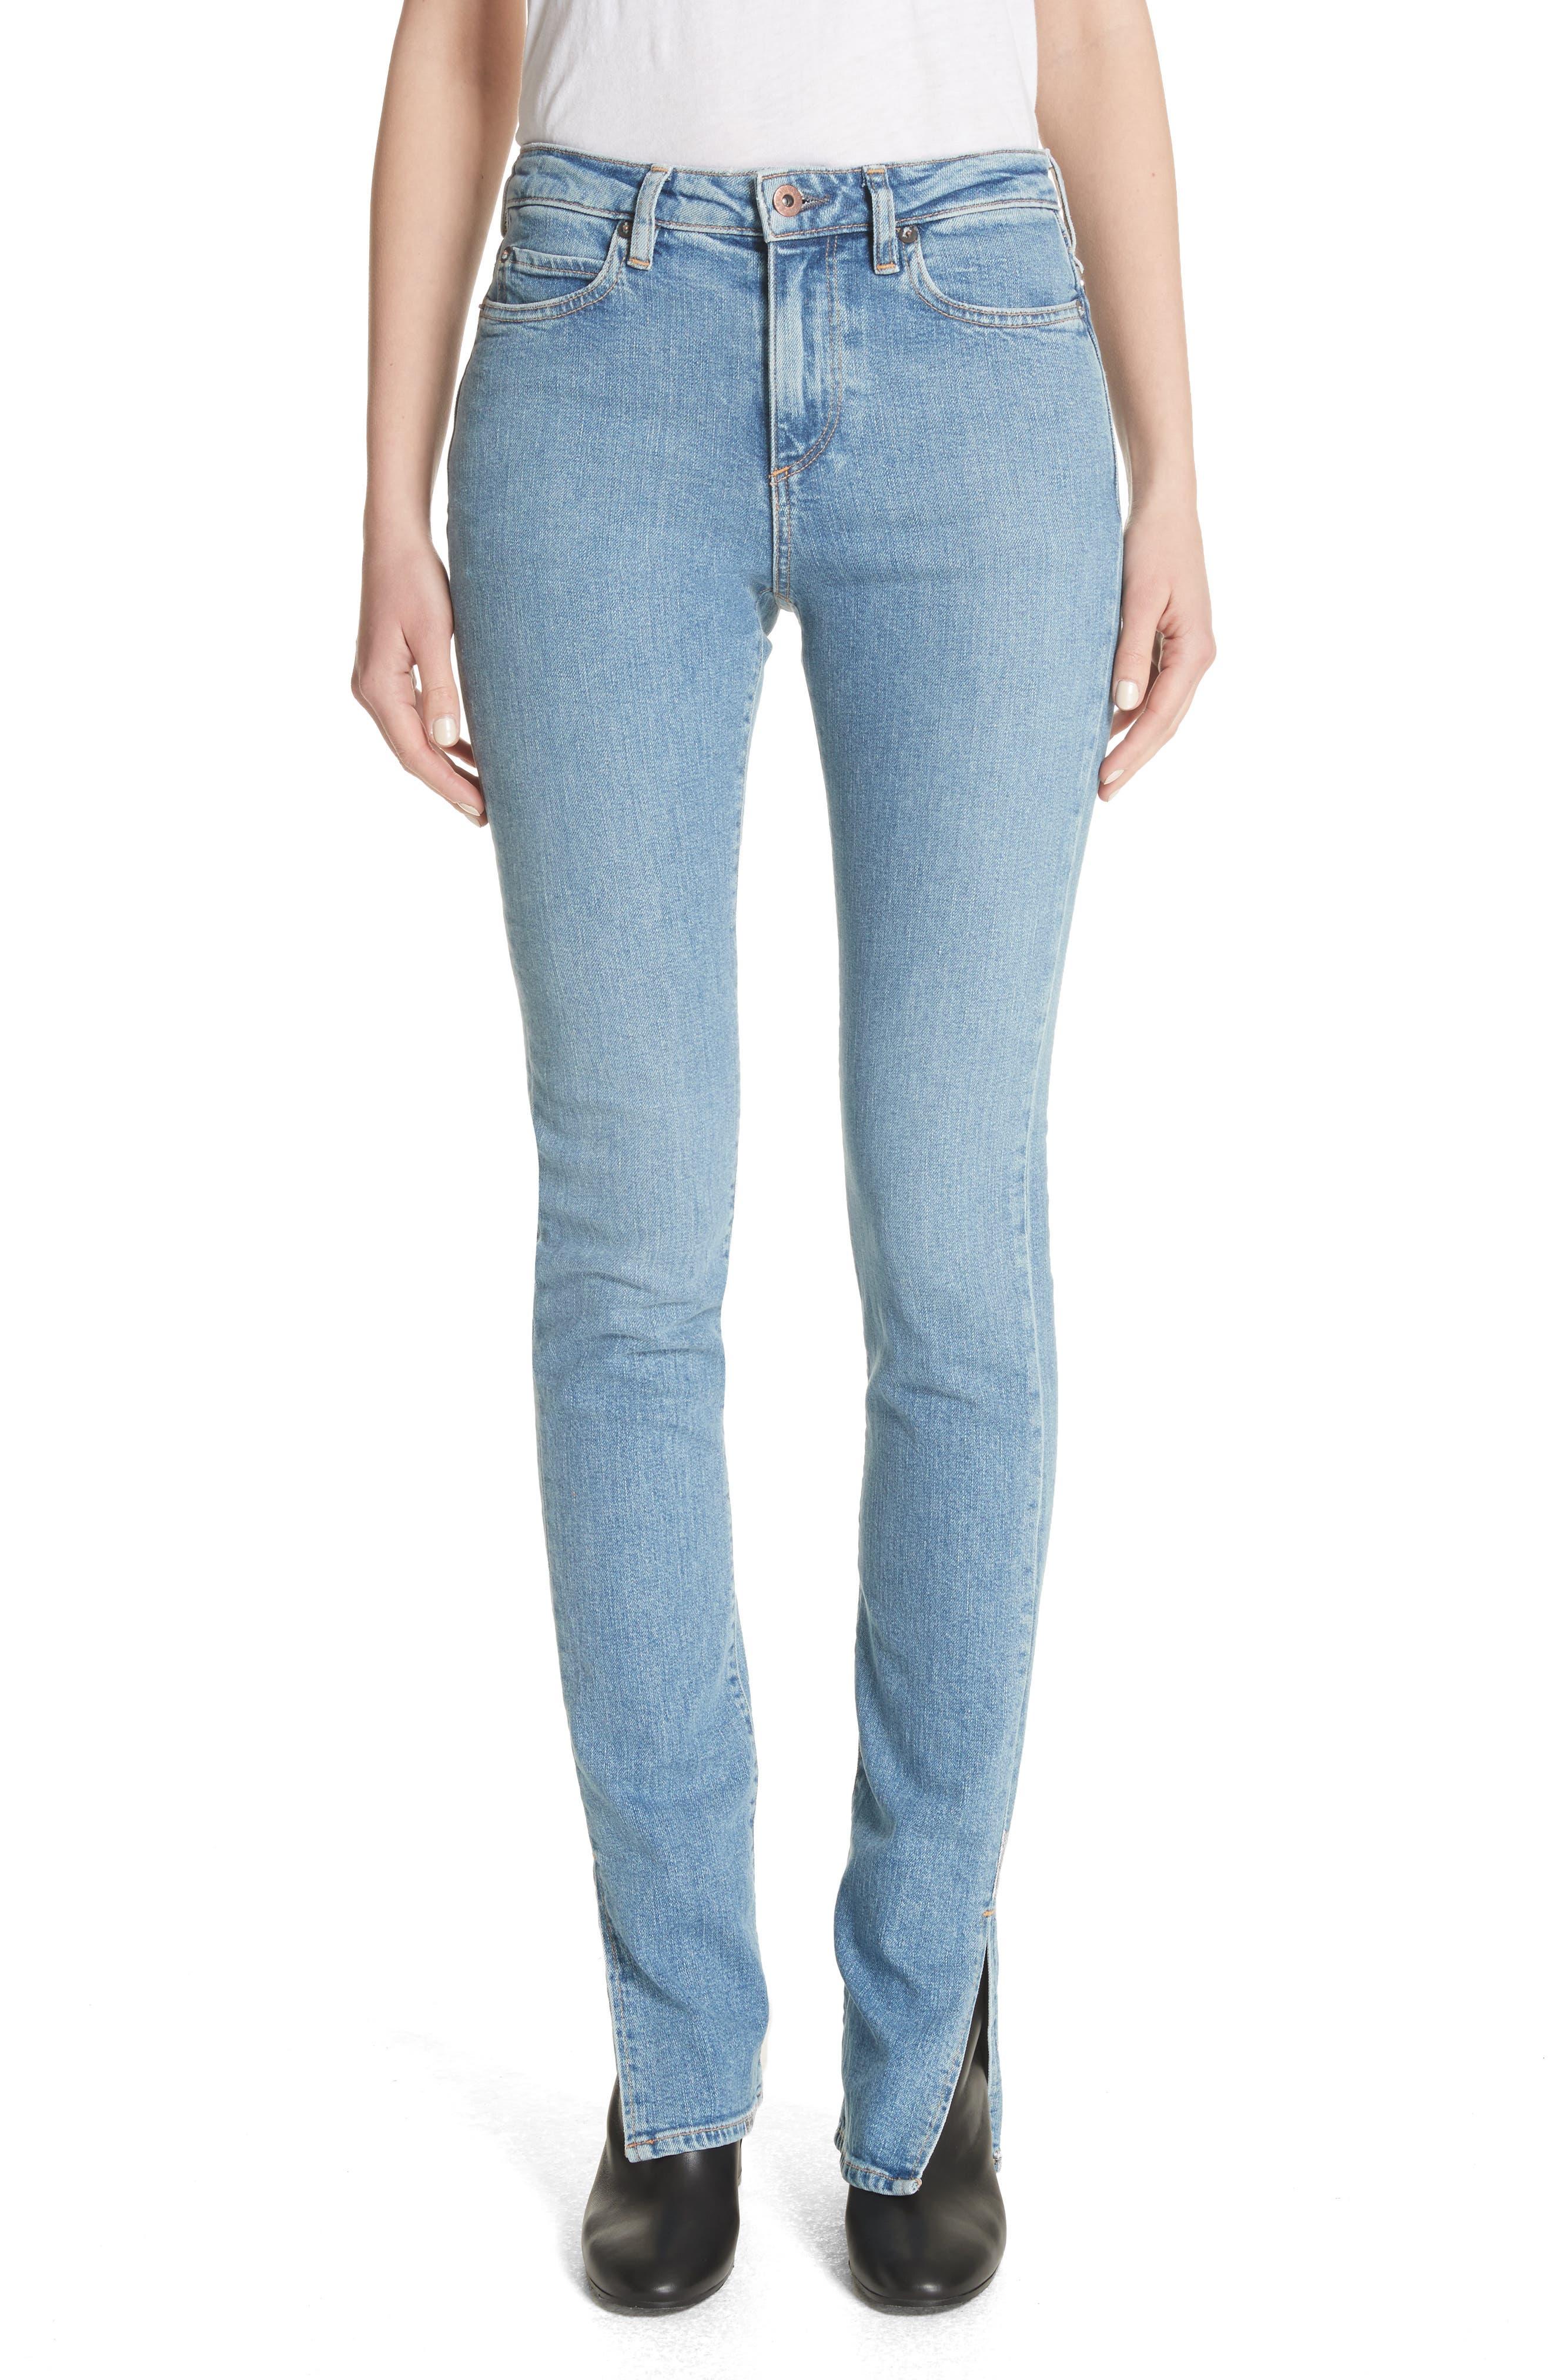 Lowry Split Hem Jeans,                         Main,                         color, Mid Indigo Wash